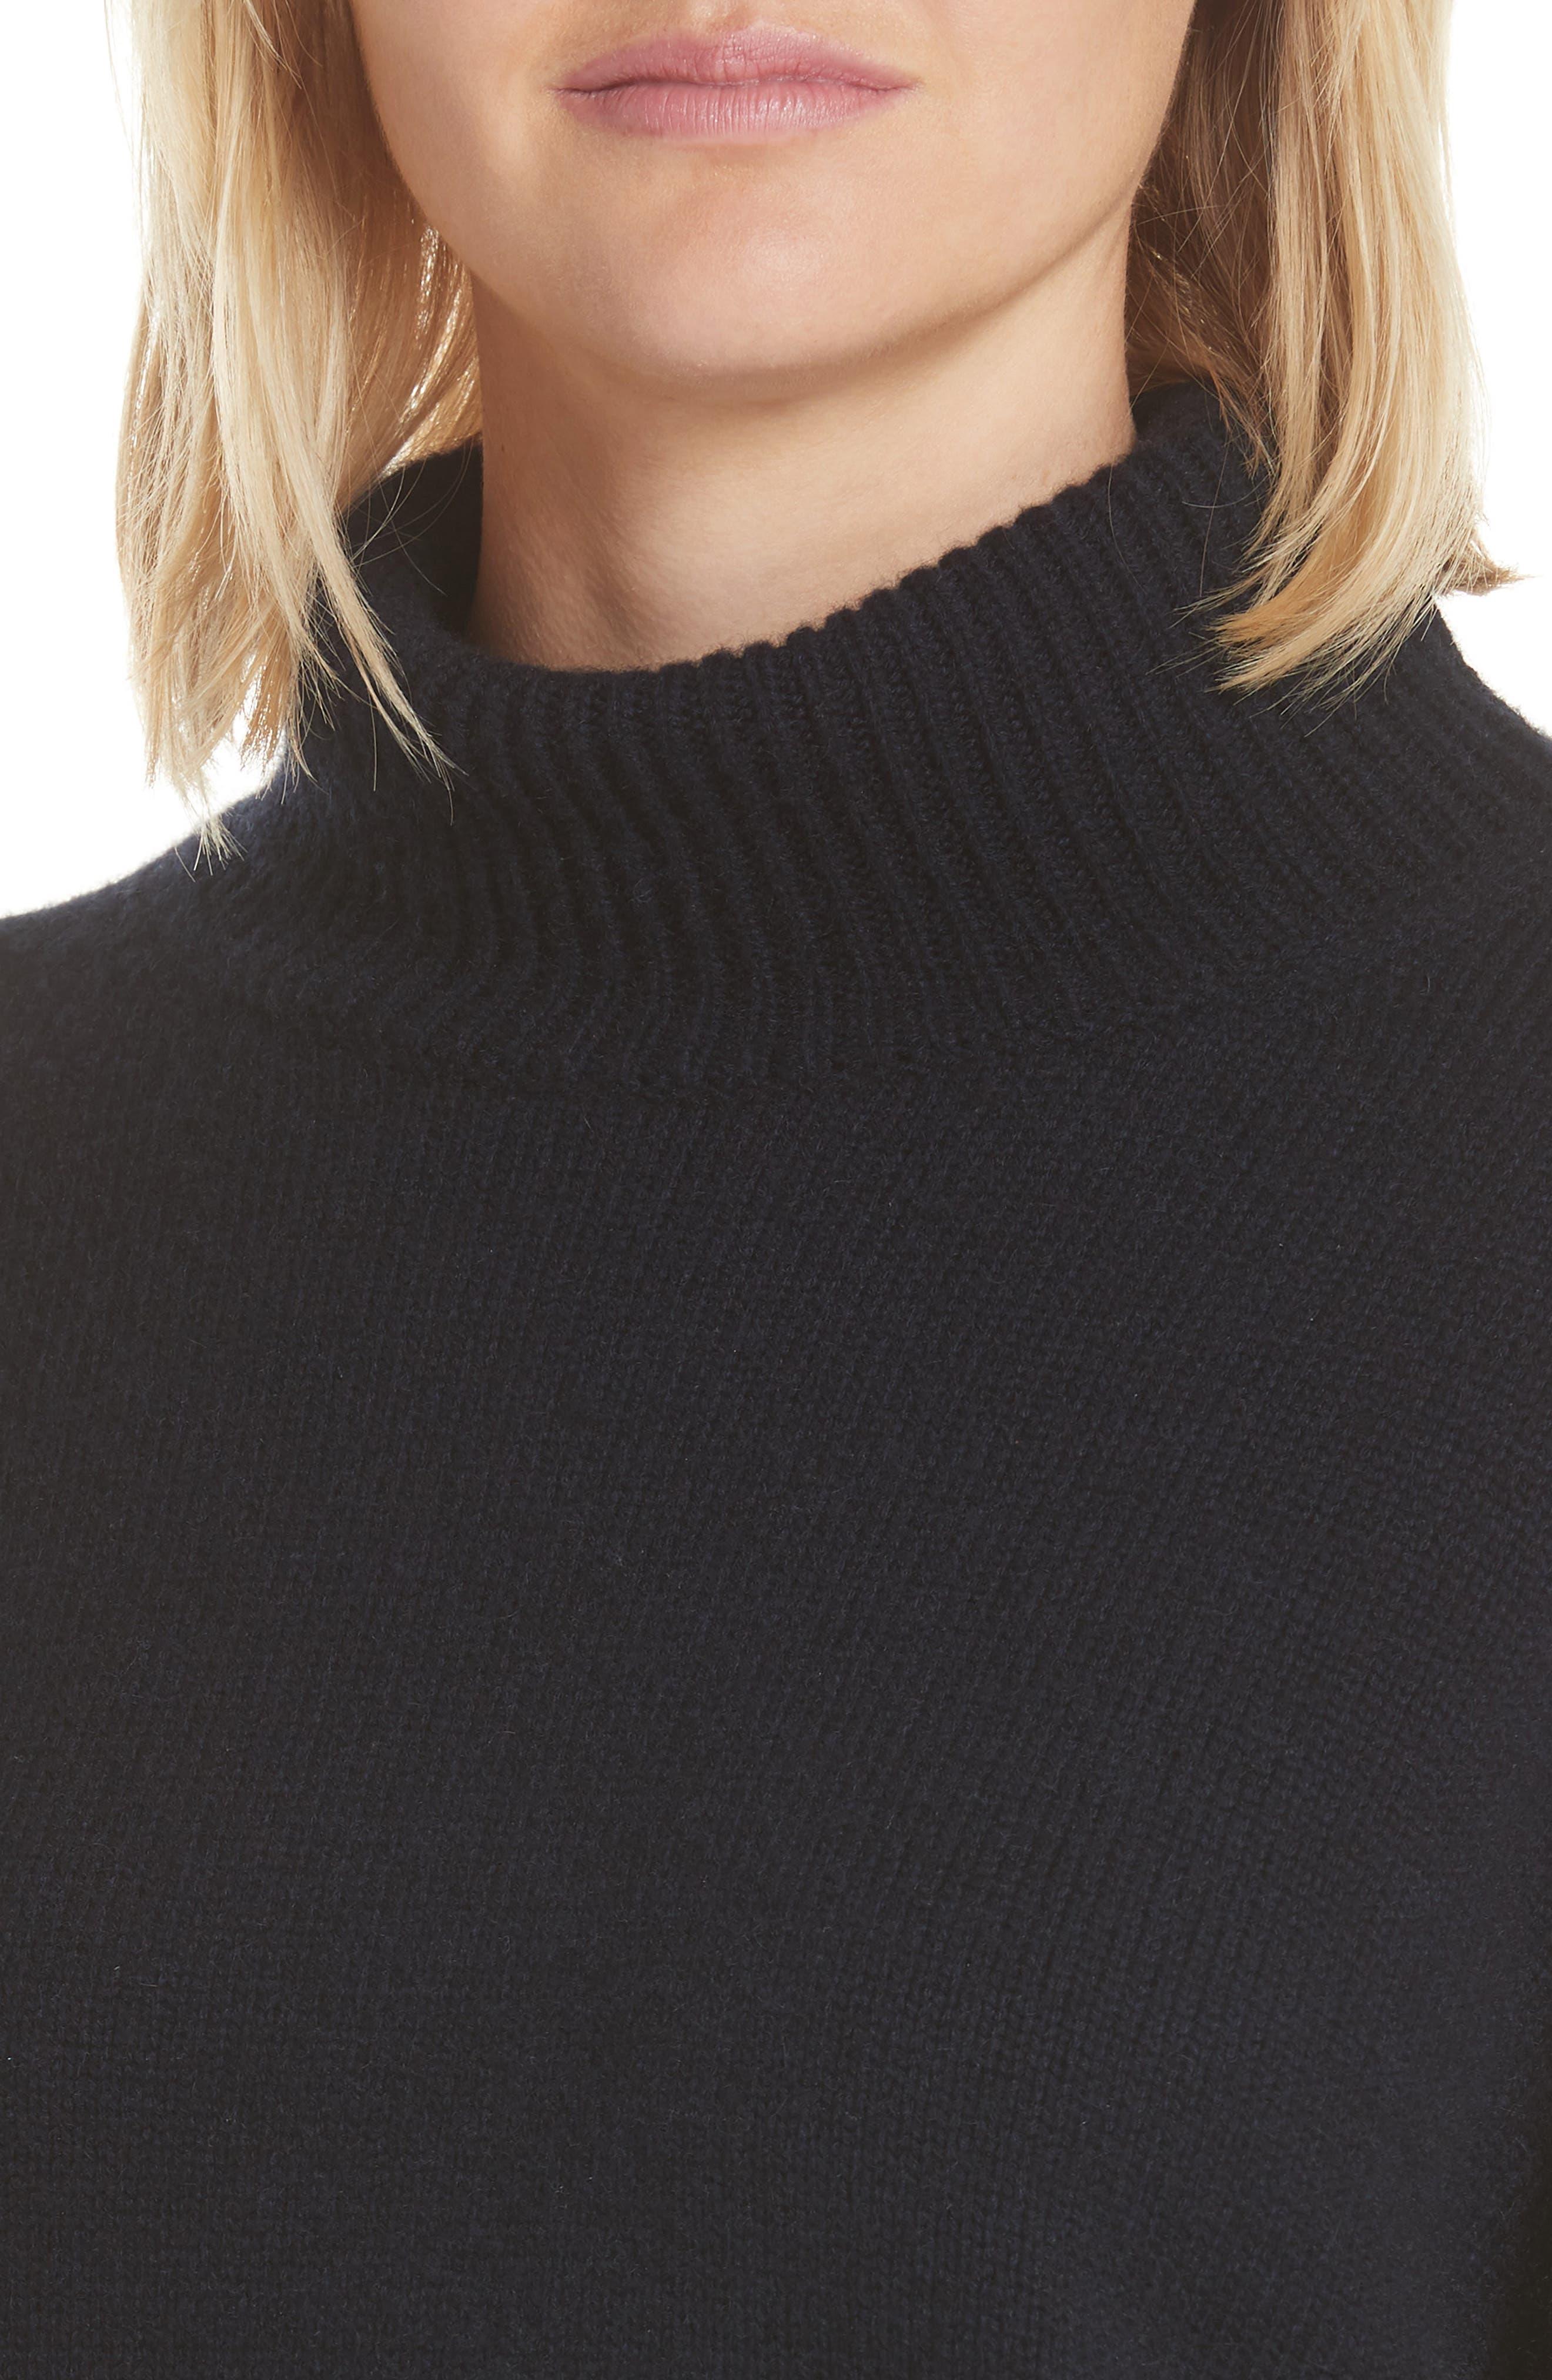 Serinda Wool & Cashmere Turtleneck Sweater,                             Alternate thumbnail 4, color,                             Dark Navy